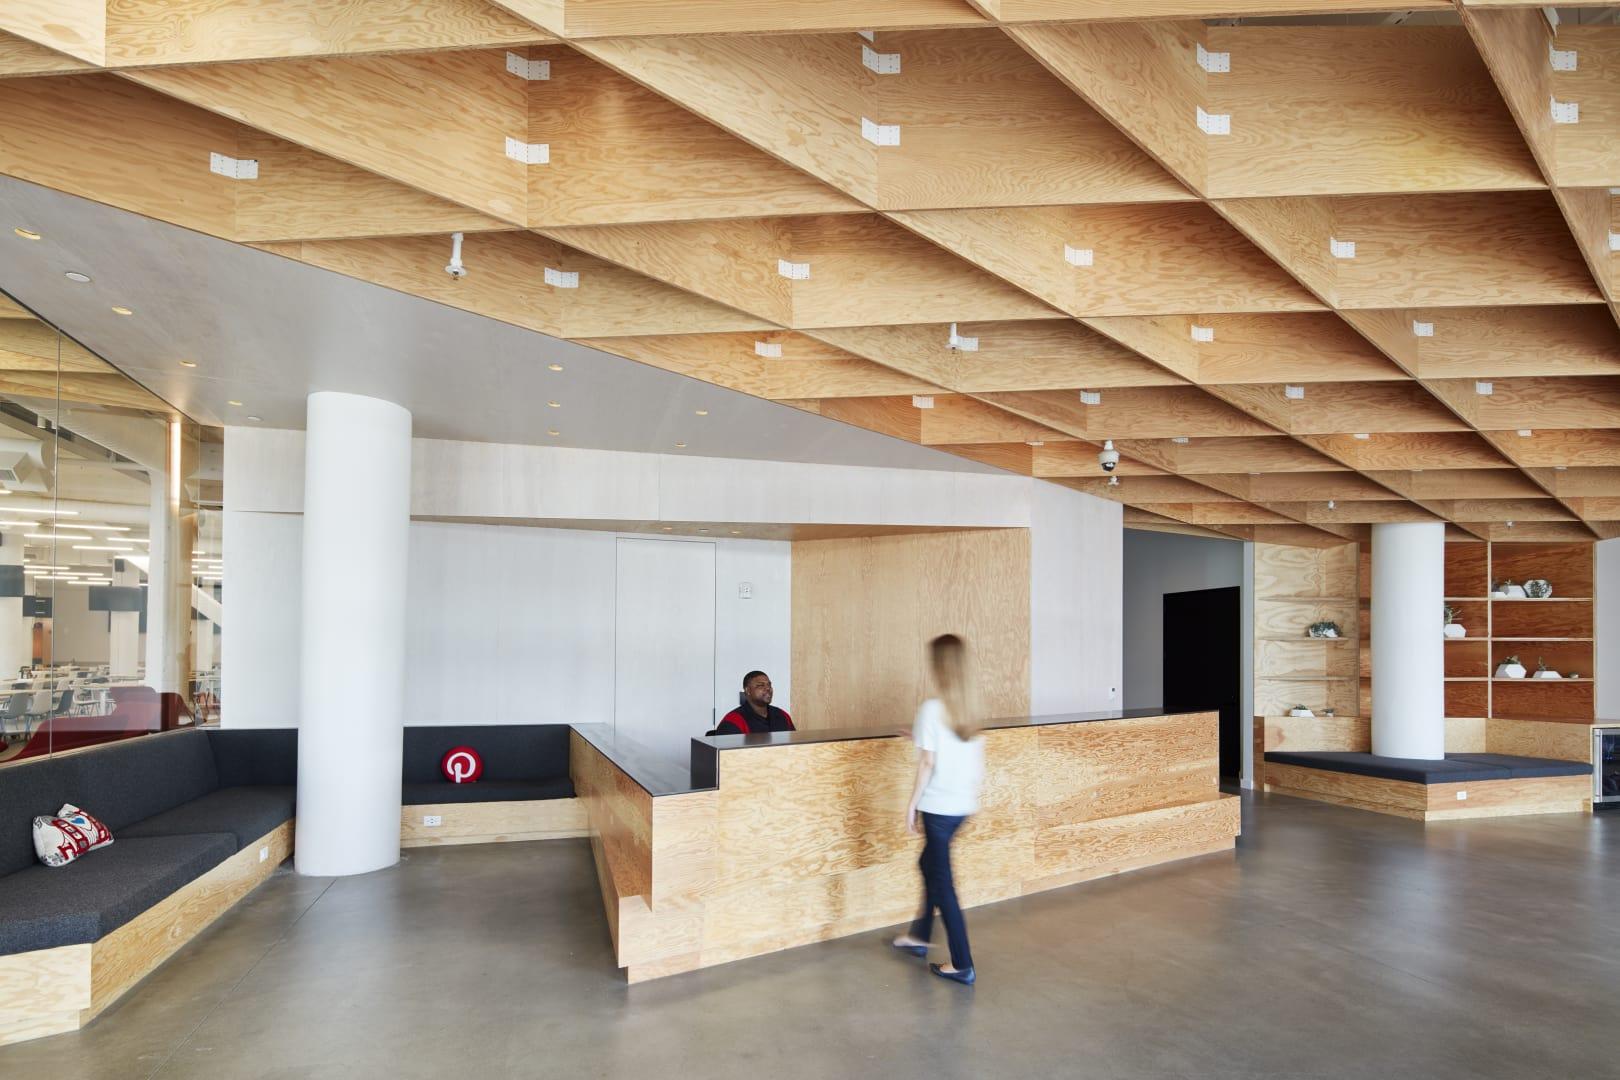 2017 AIA Awards  Interior Architecture